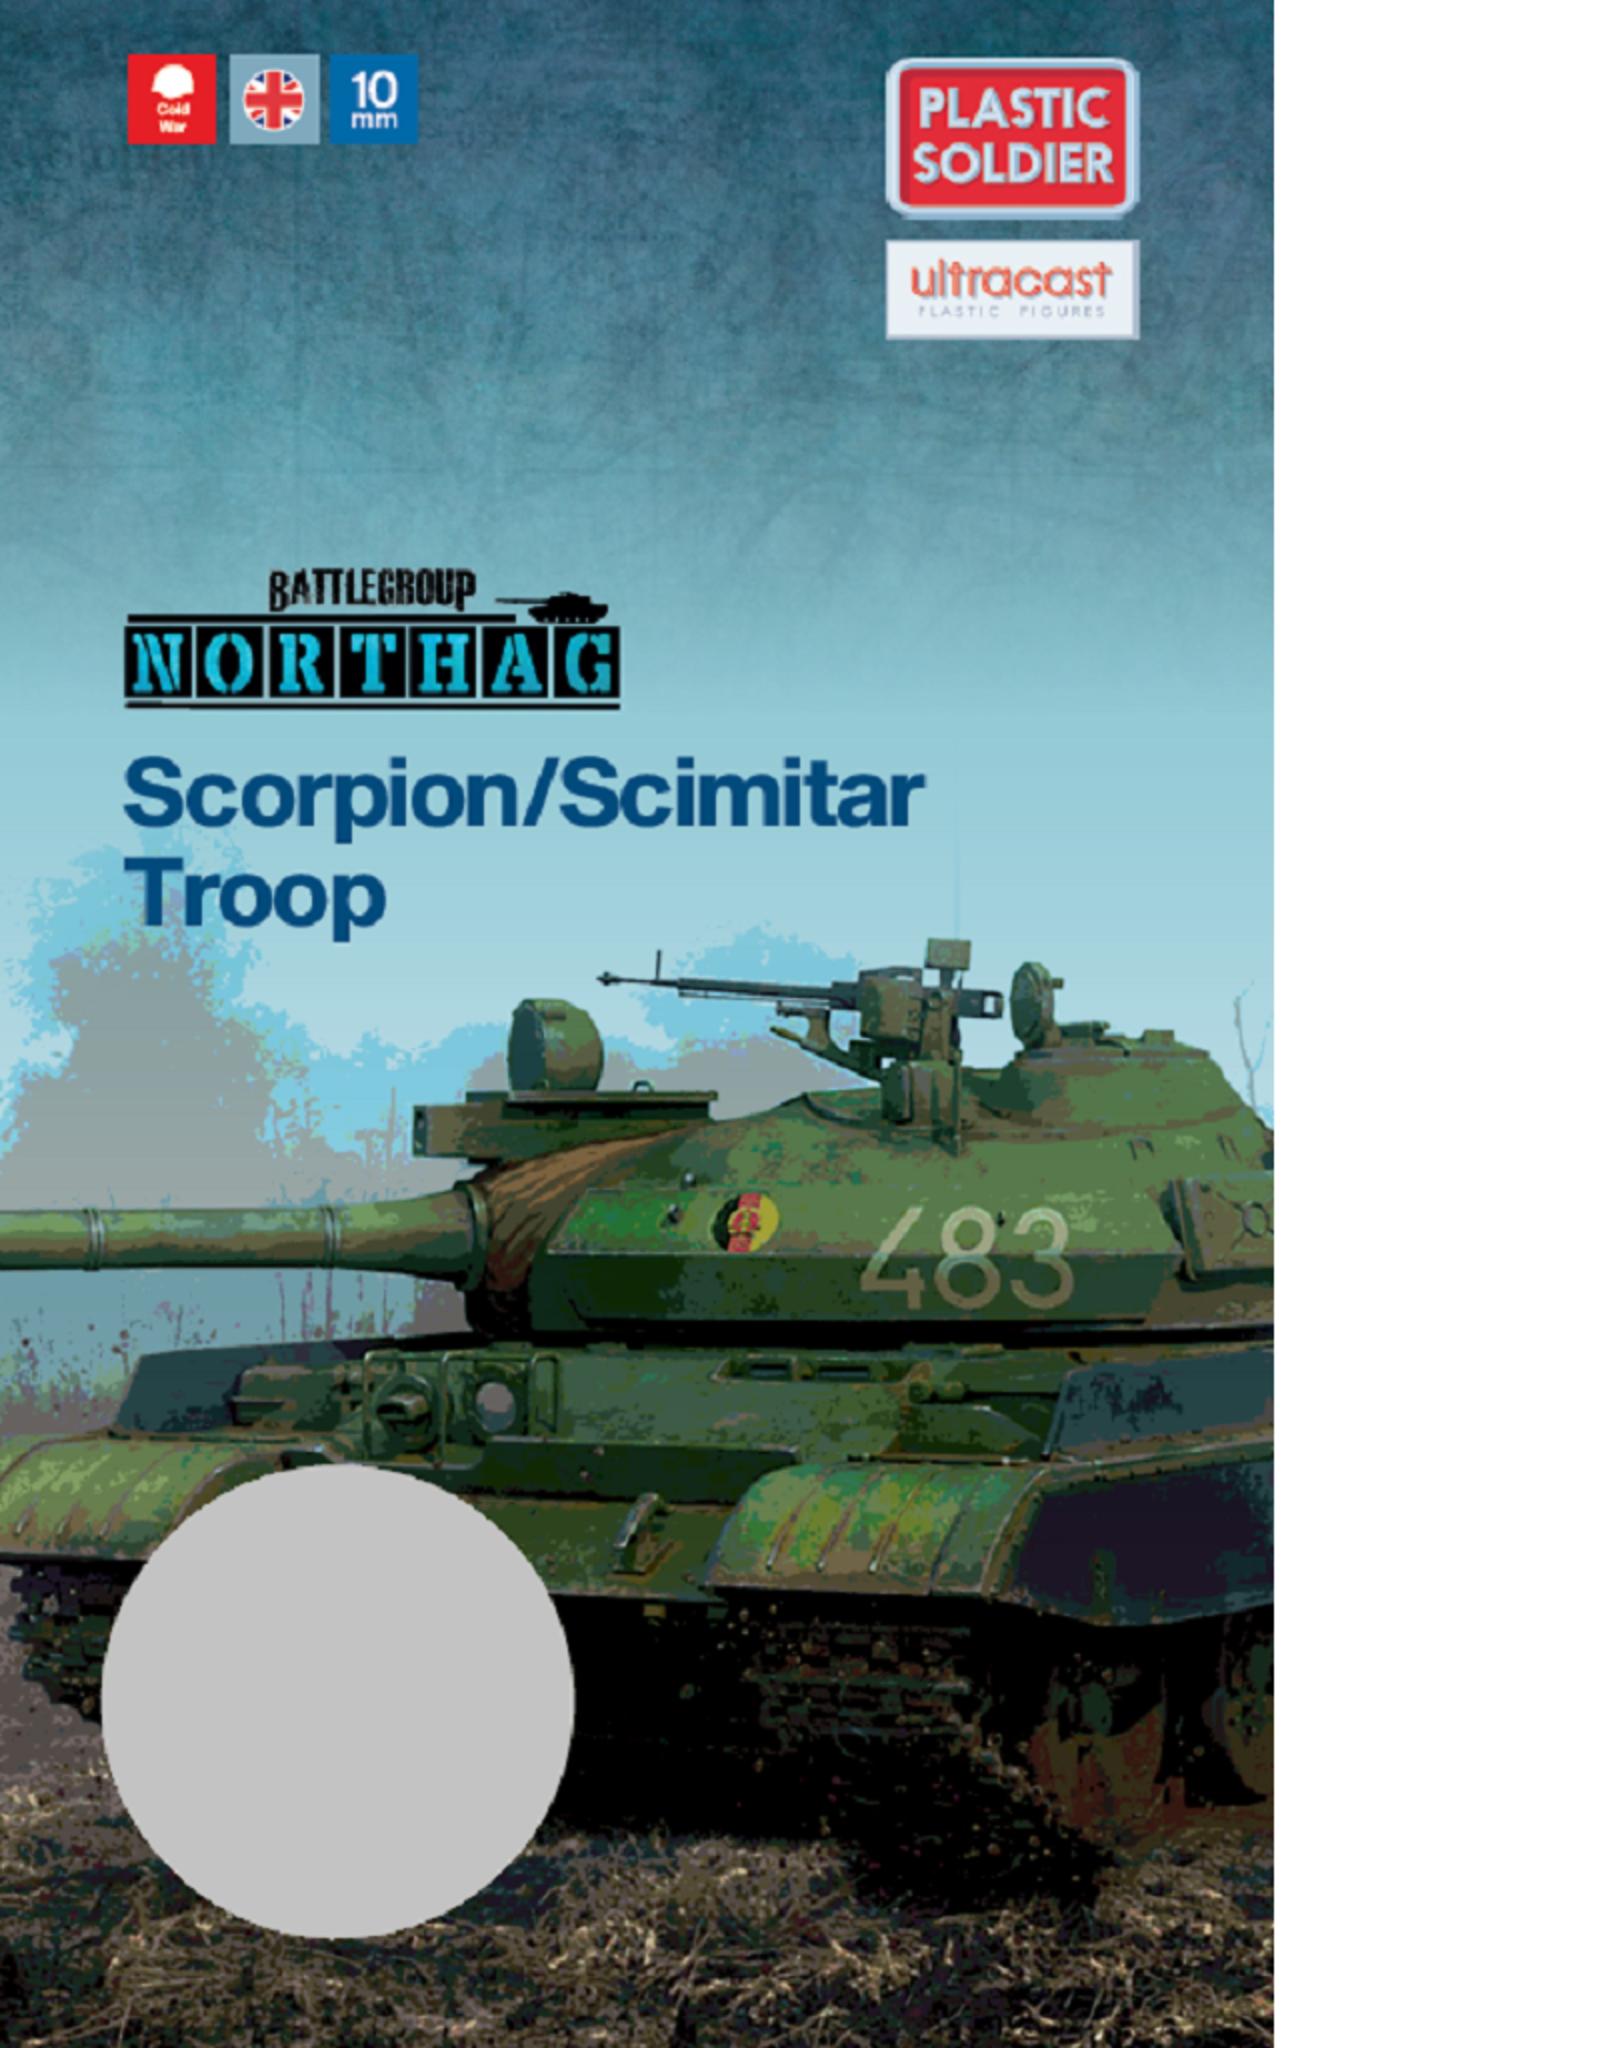 Plastic Soldier Company British Scorpion/Scimitar Troop